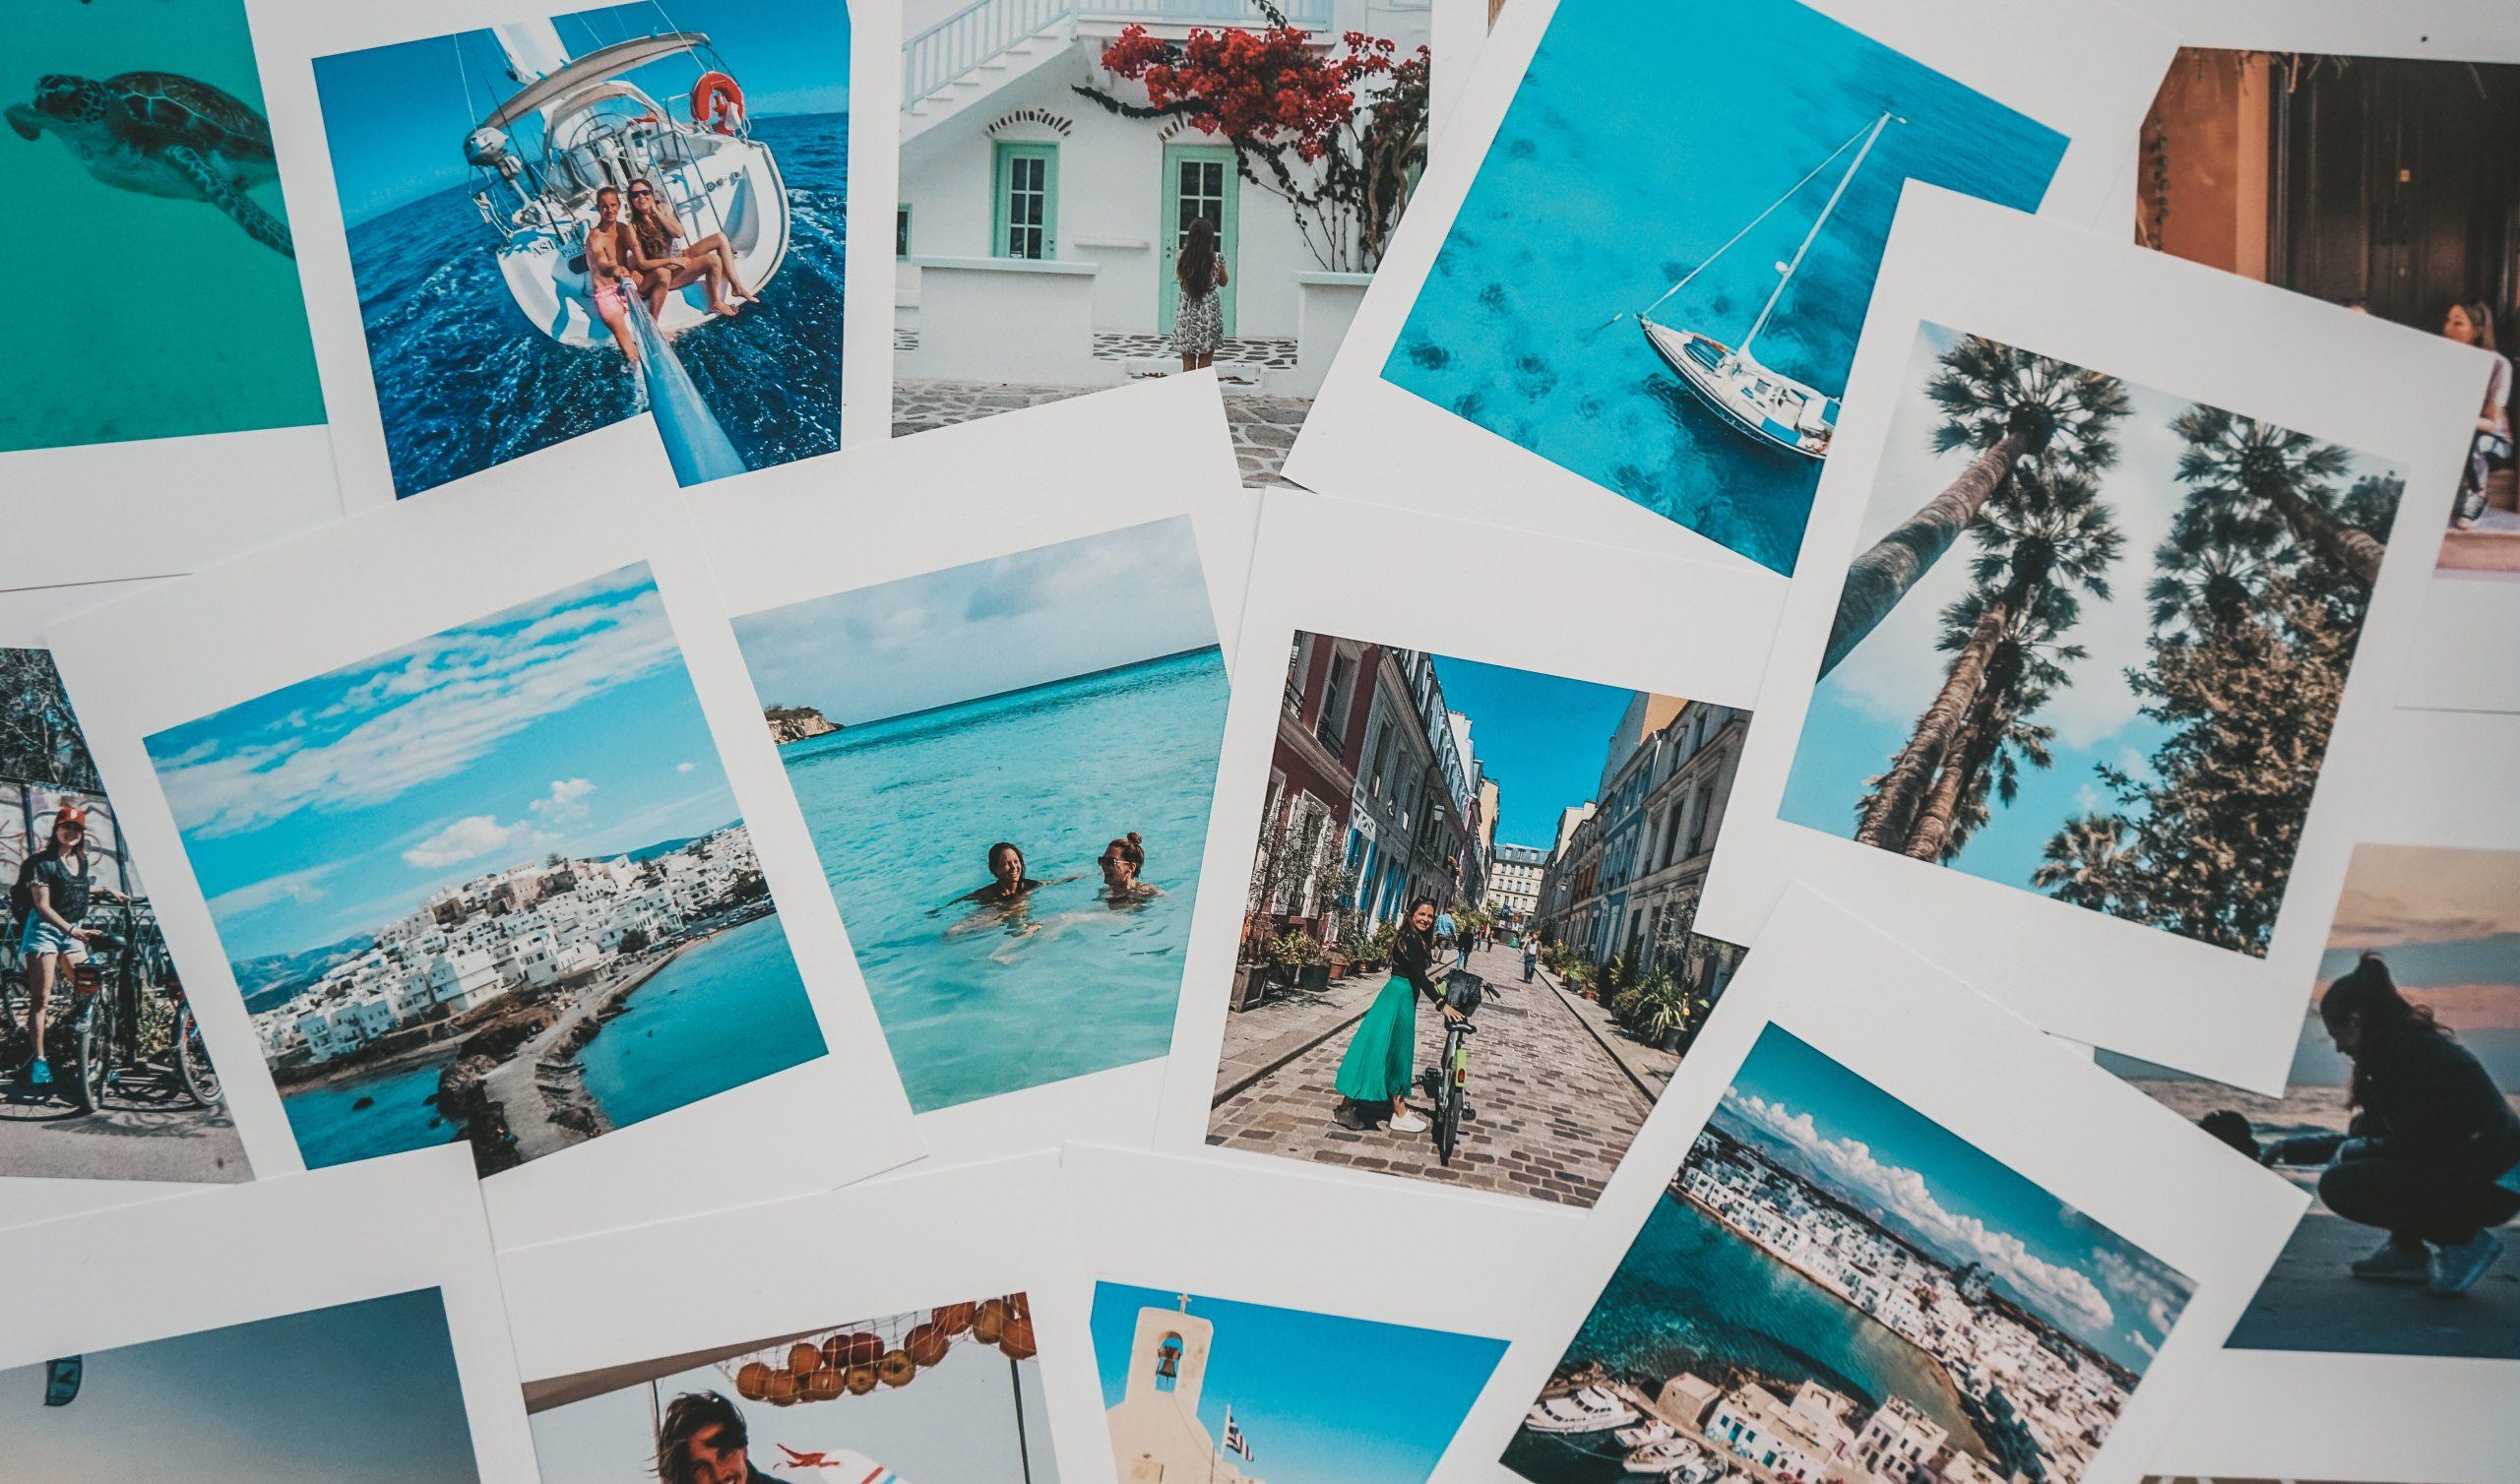 fotofabriek vakantiegevoel